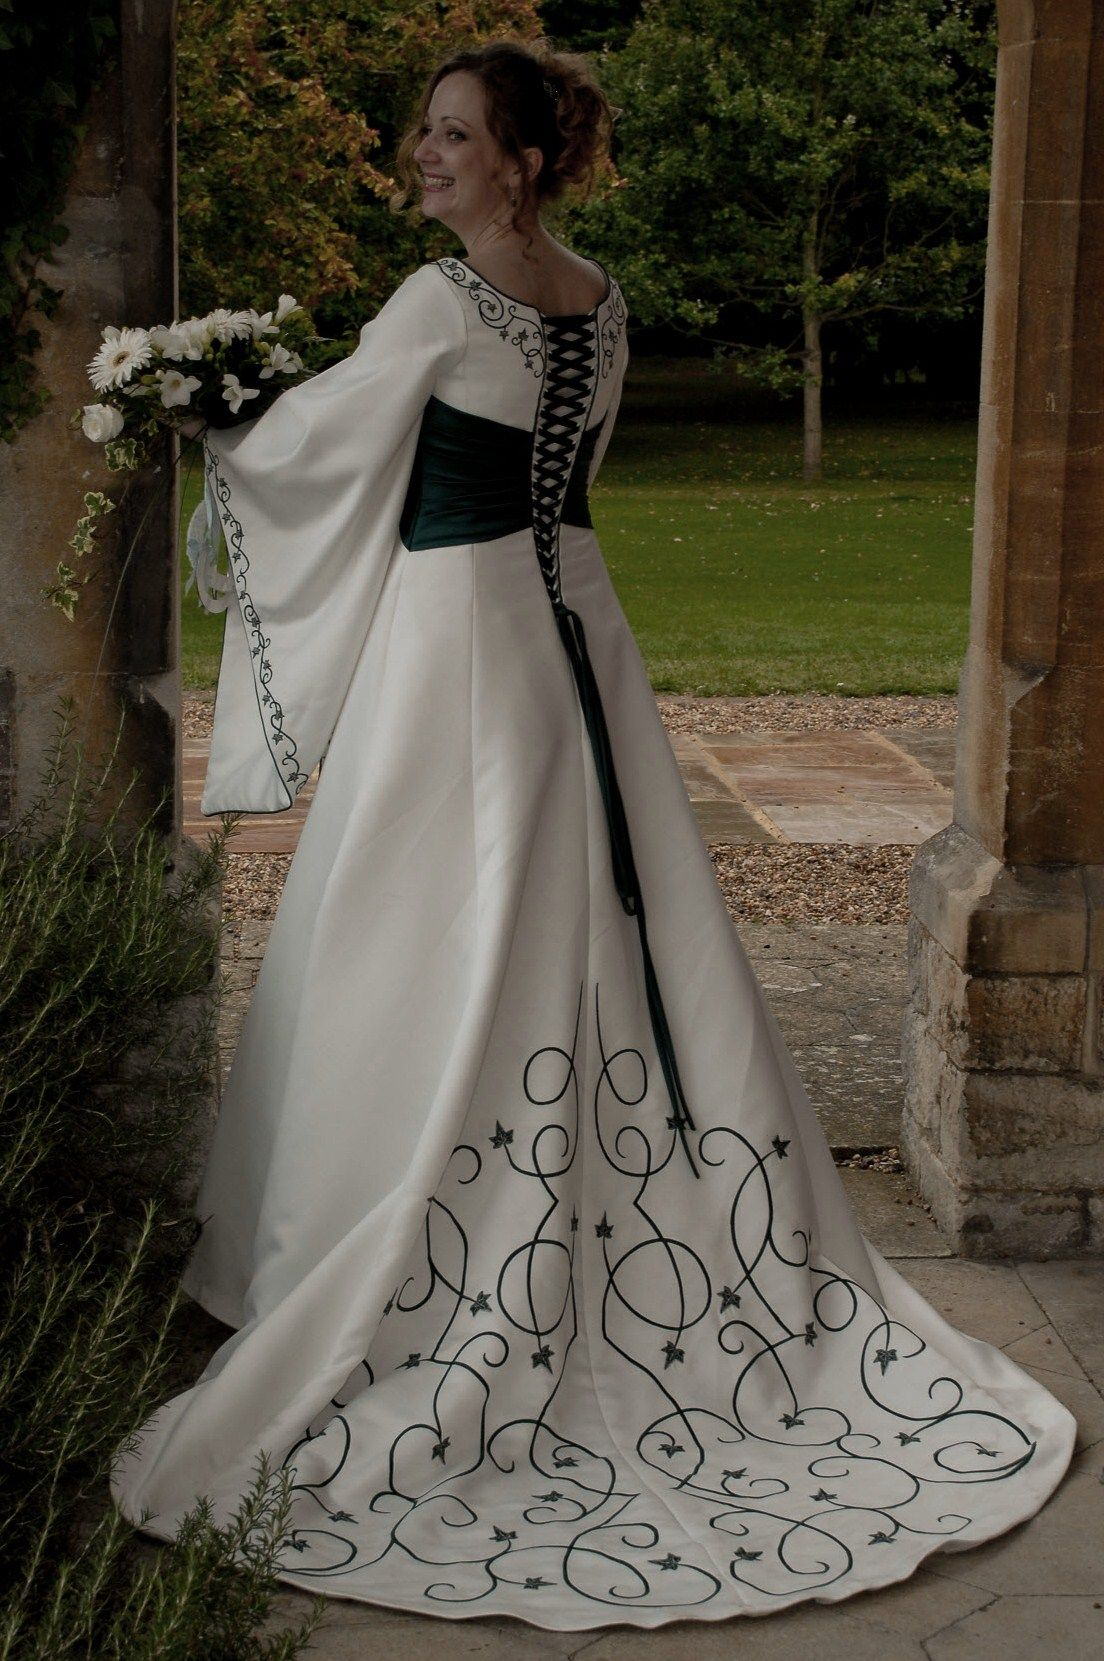 Medieval Wedding Dresses Fairy Celtic Wedding Dresses By Rivendell Bridal In The Uk Celtic Wedding Dress Scottish Wedding Dresses Modern Short Wedding Dress